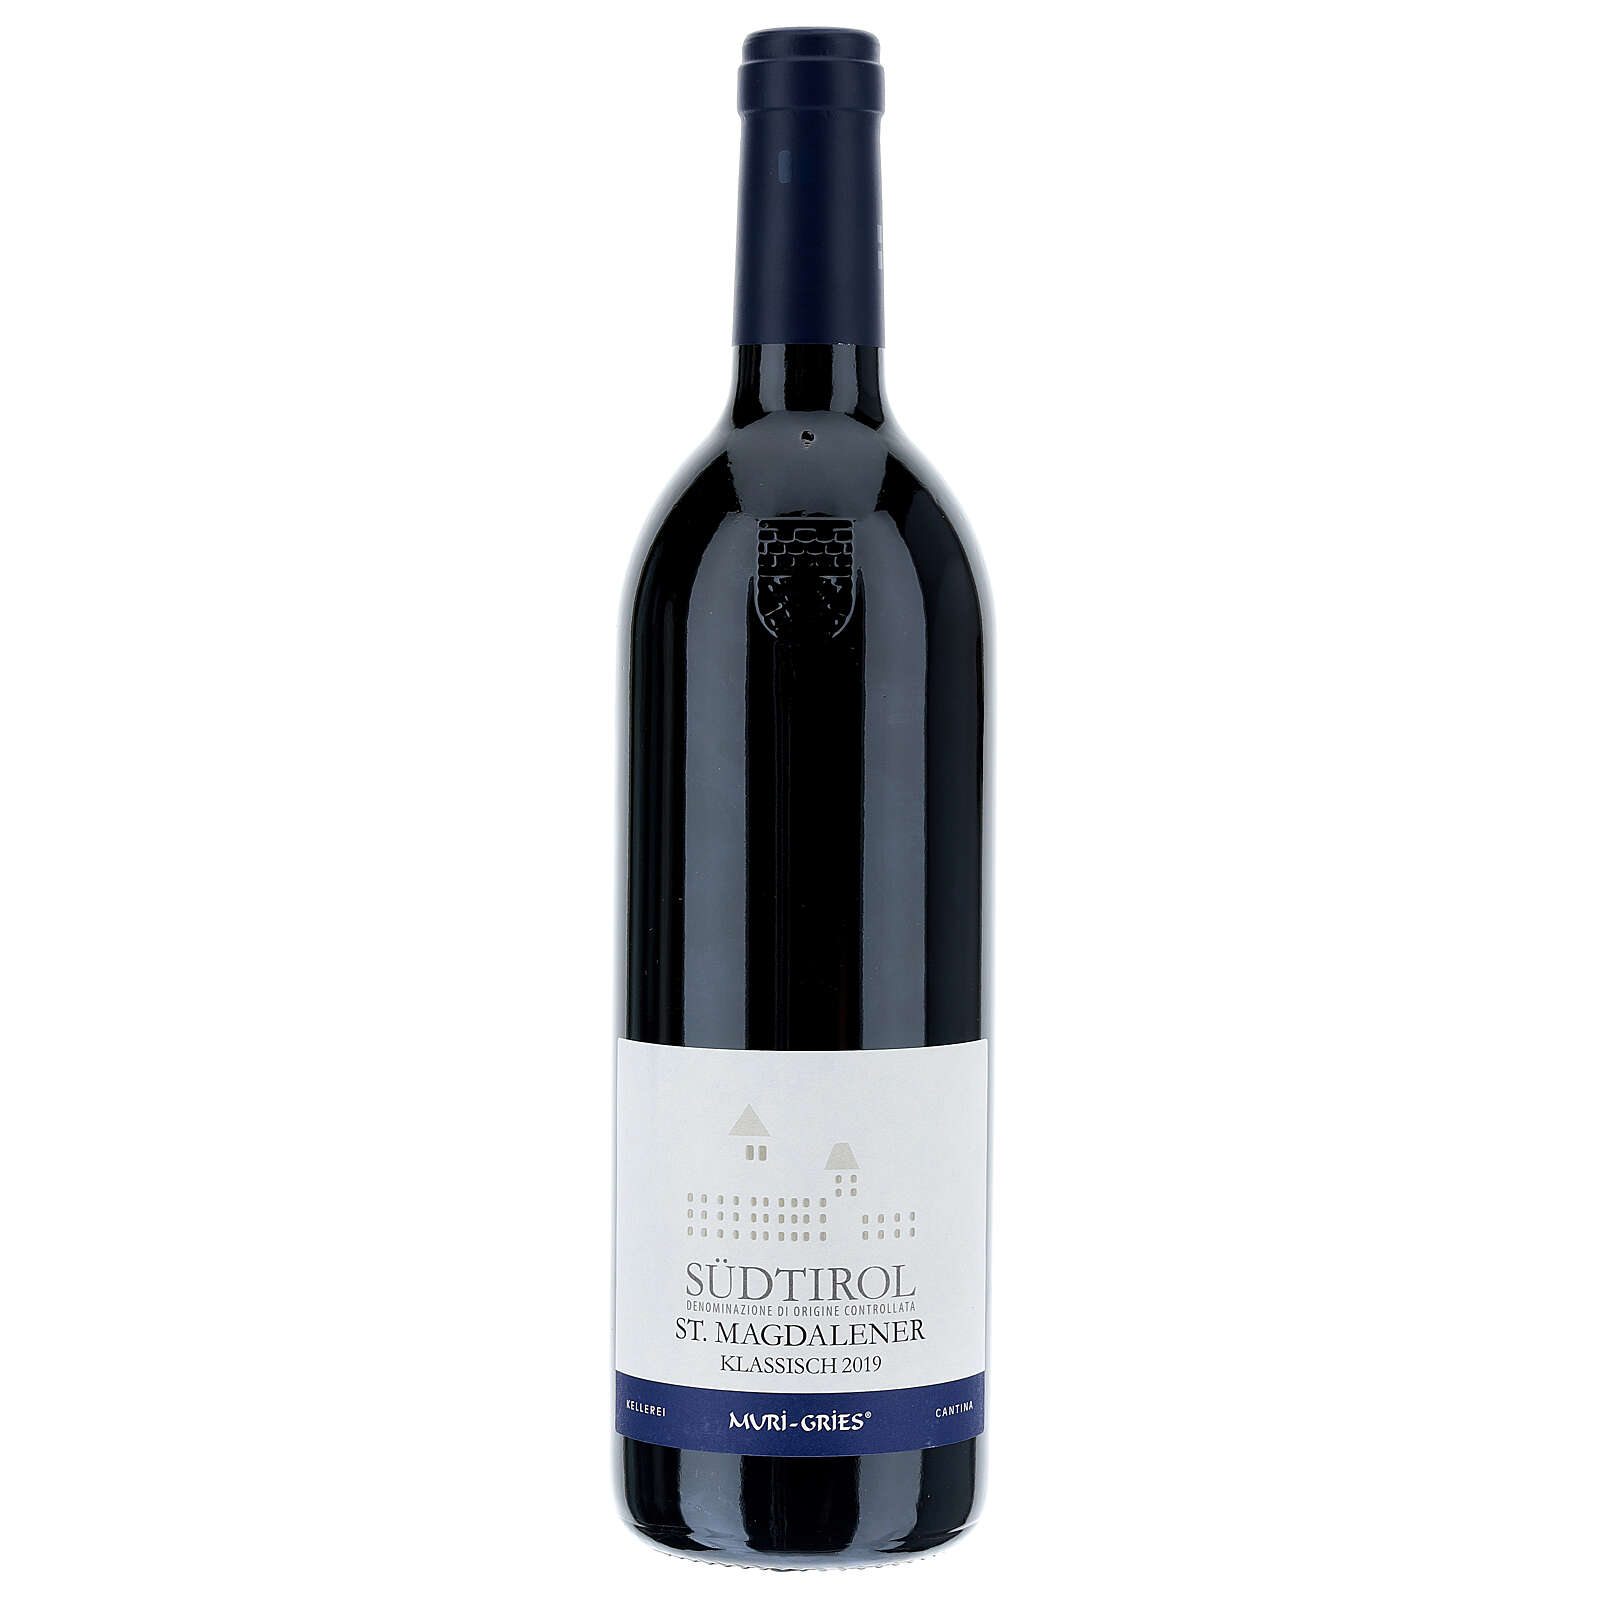 St. Maddalena DOC 2019 wine Muri Gries Abby 3